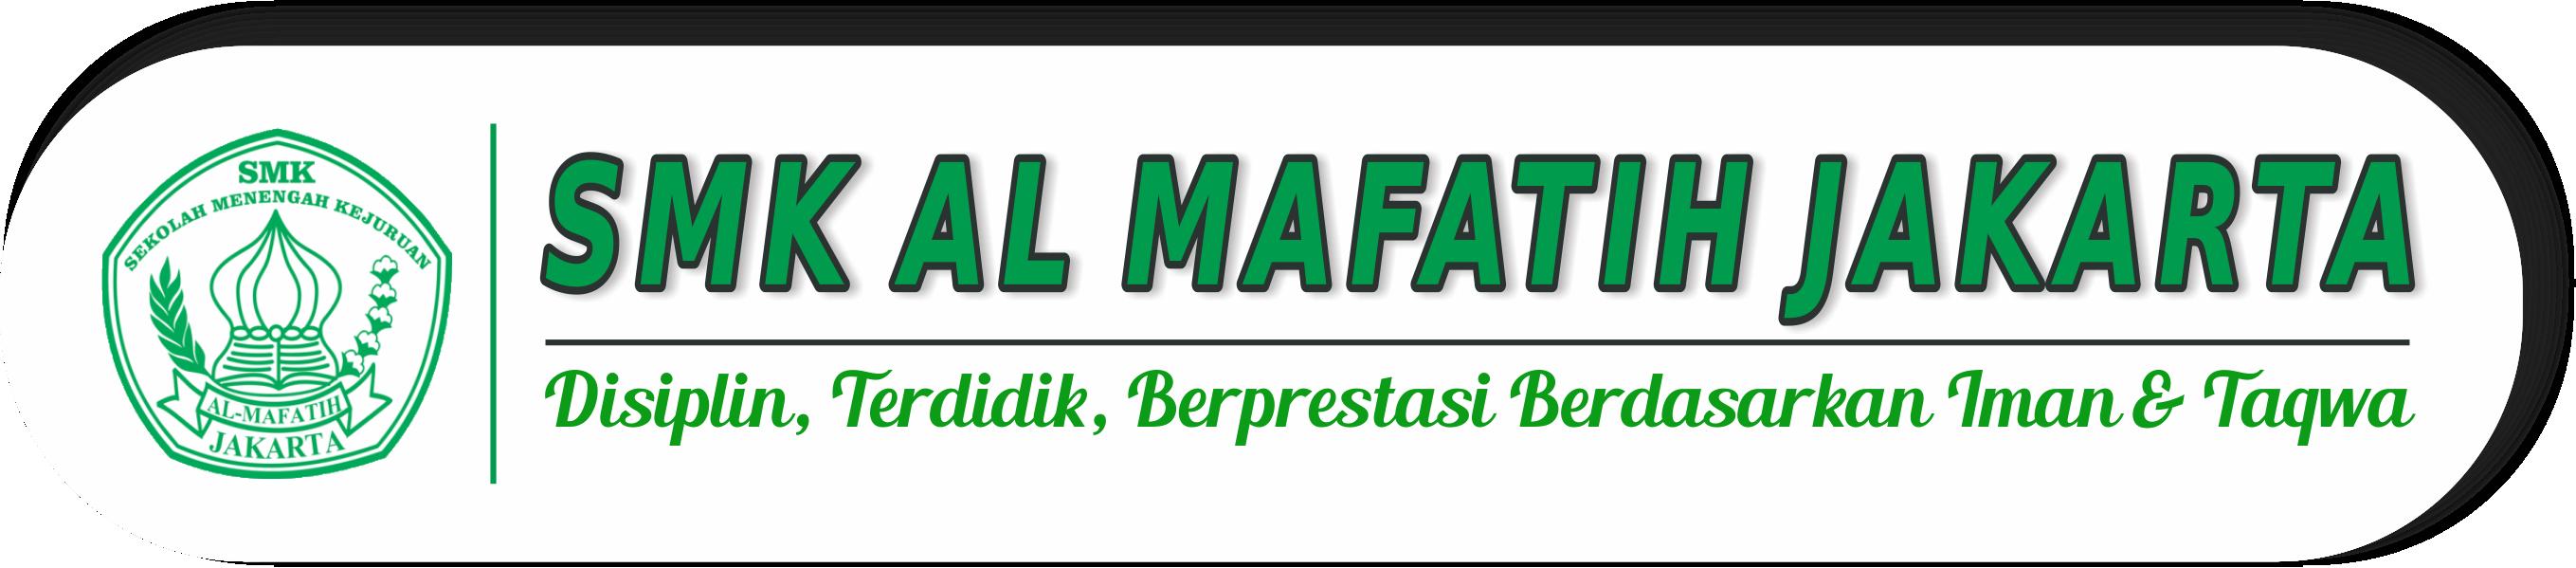 SMK AL IHSAN JAKARTA